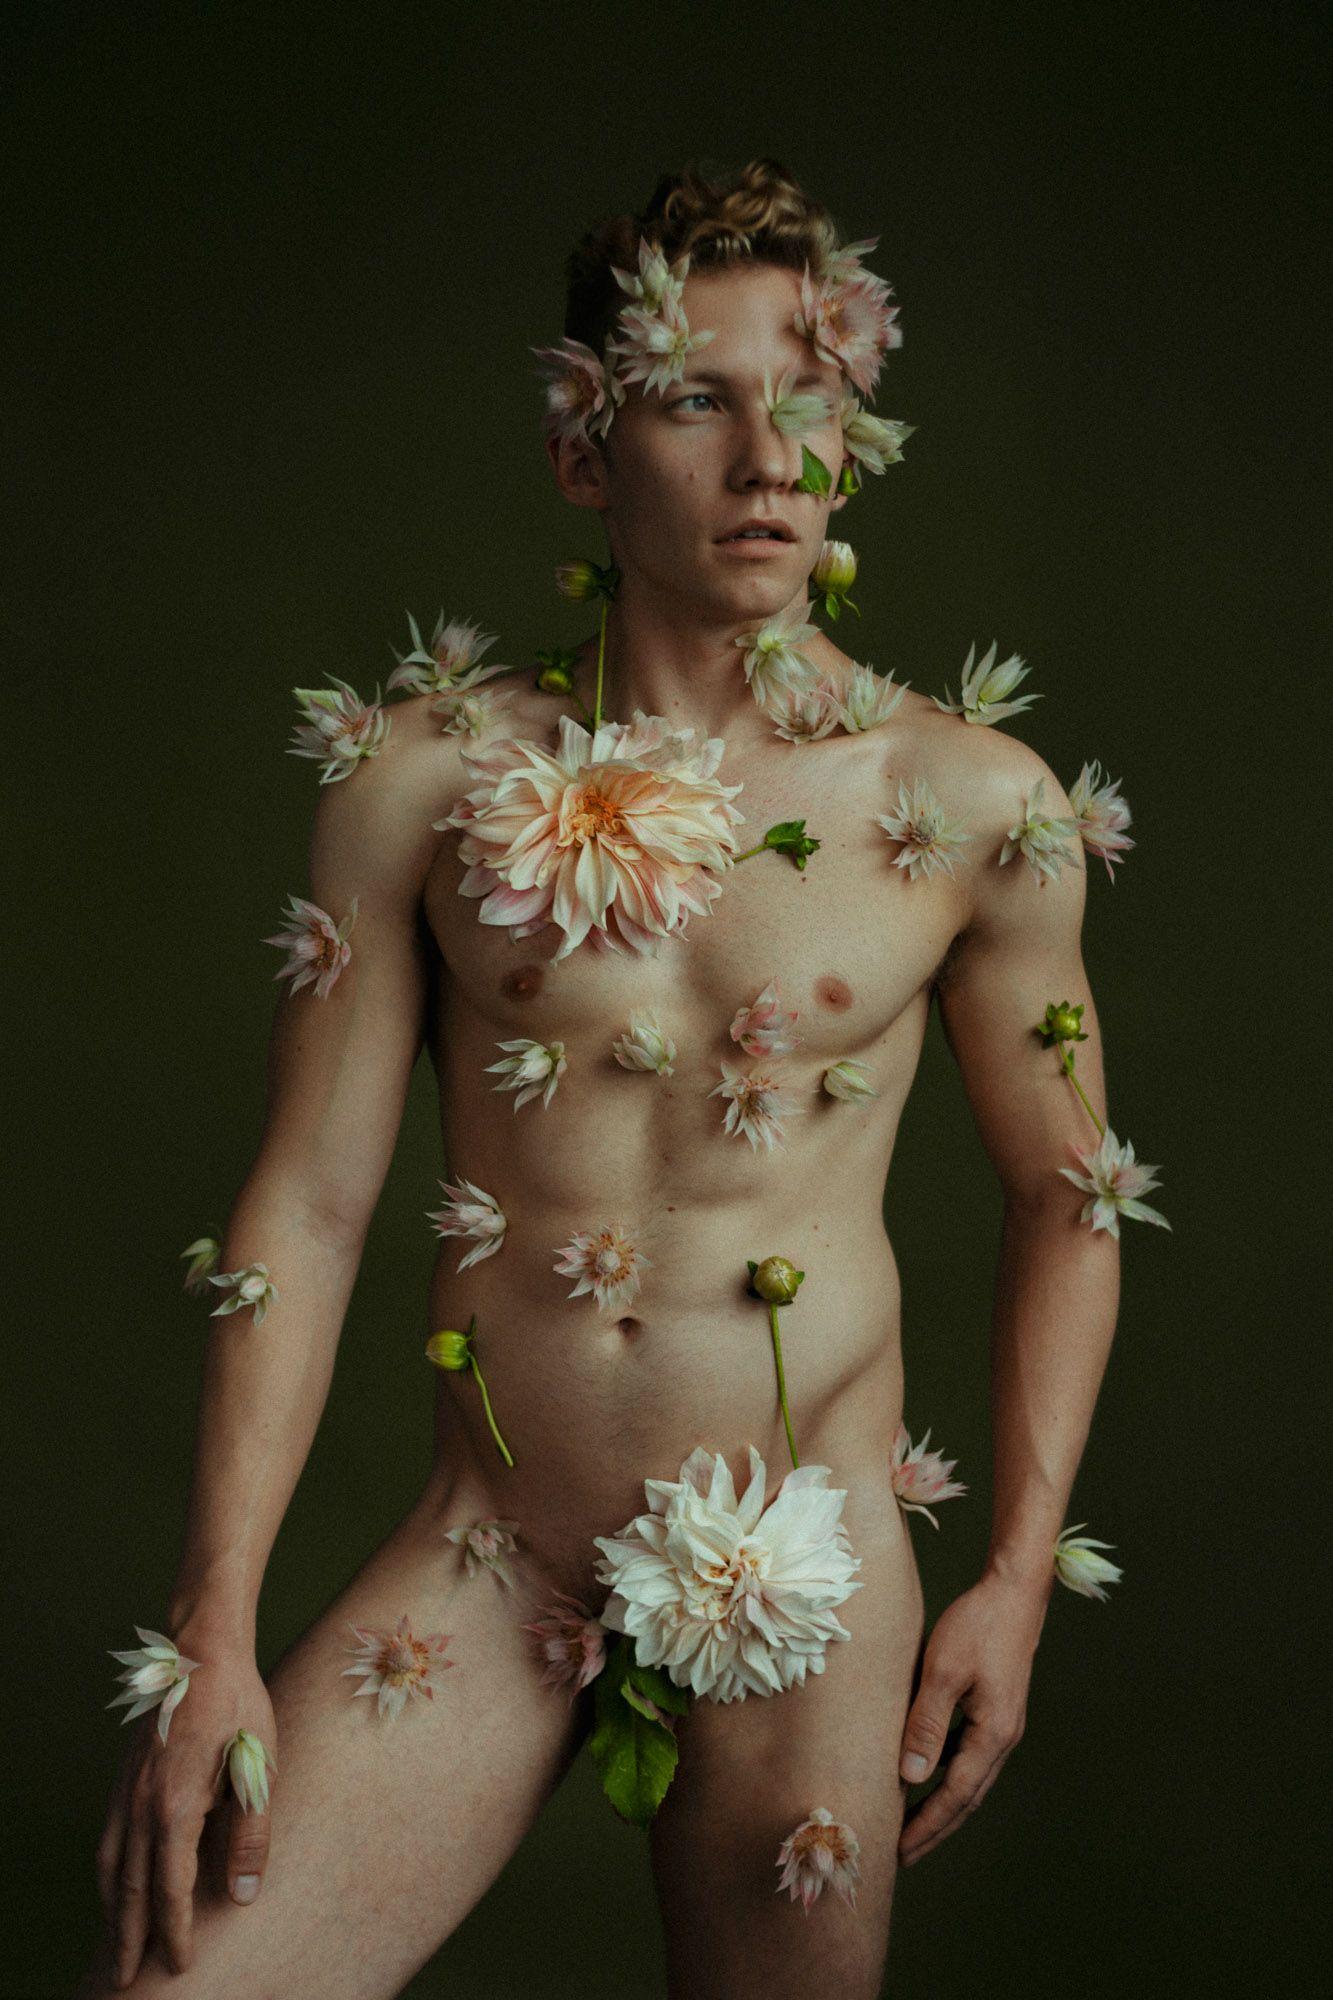 Travis Chantar Flowers